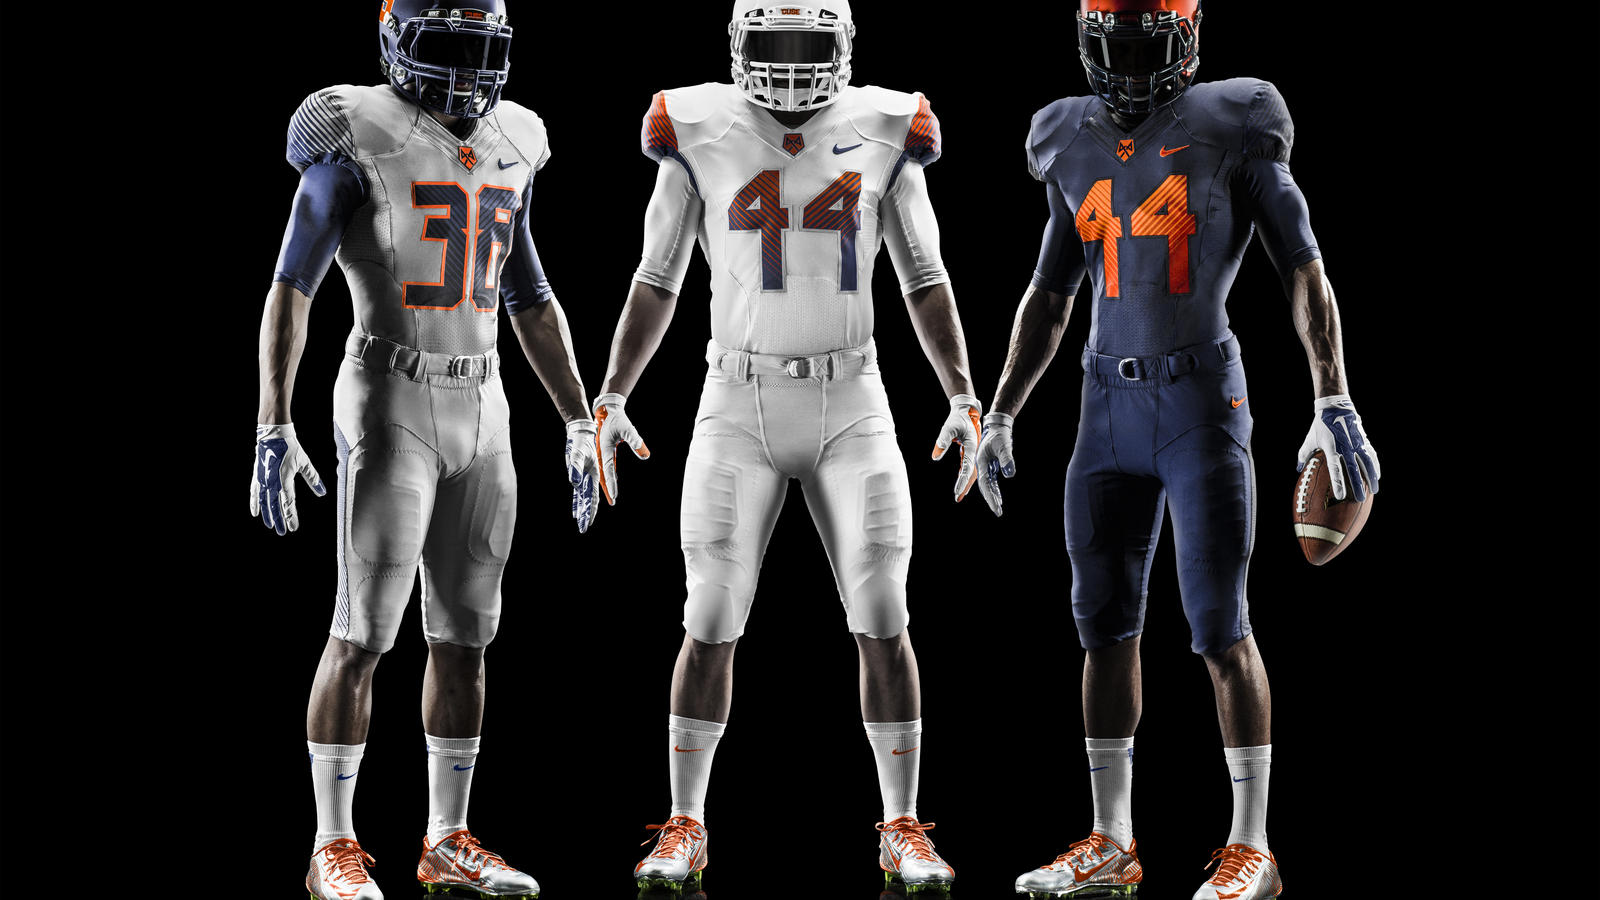 newest cf126 abfad Syracuse Unveils New 2014 Nike Football Uniforms - Nike News